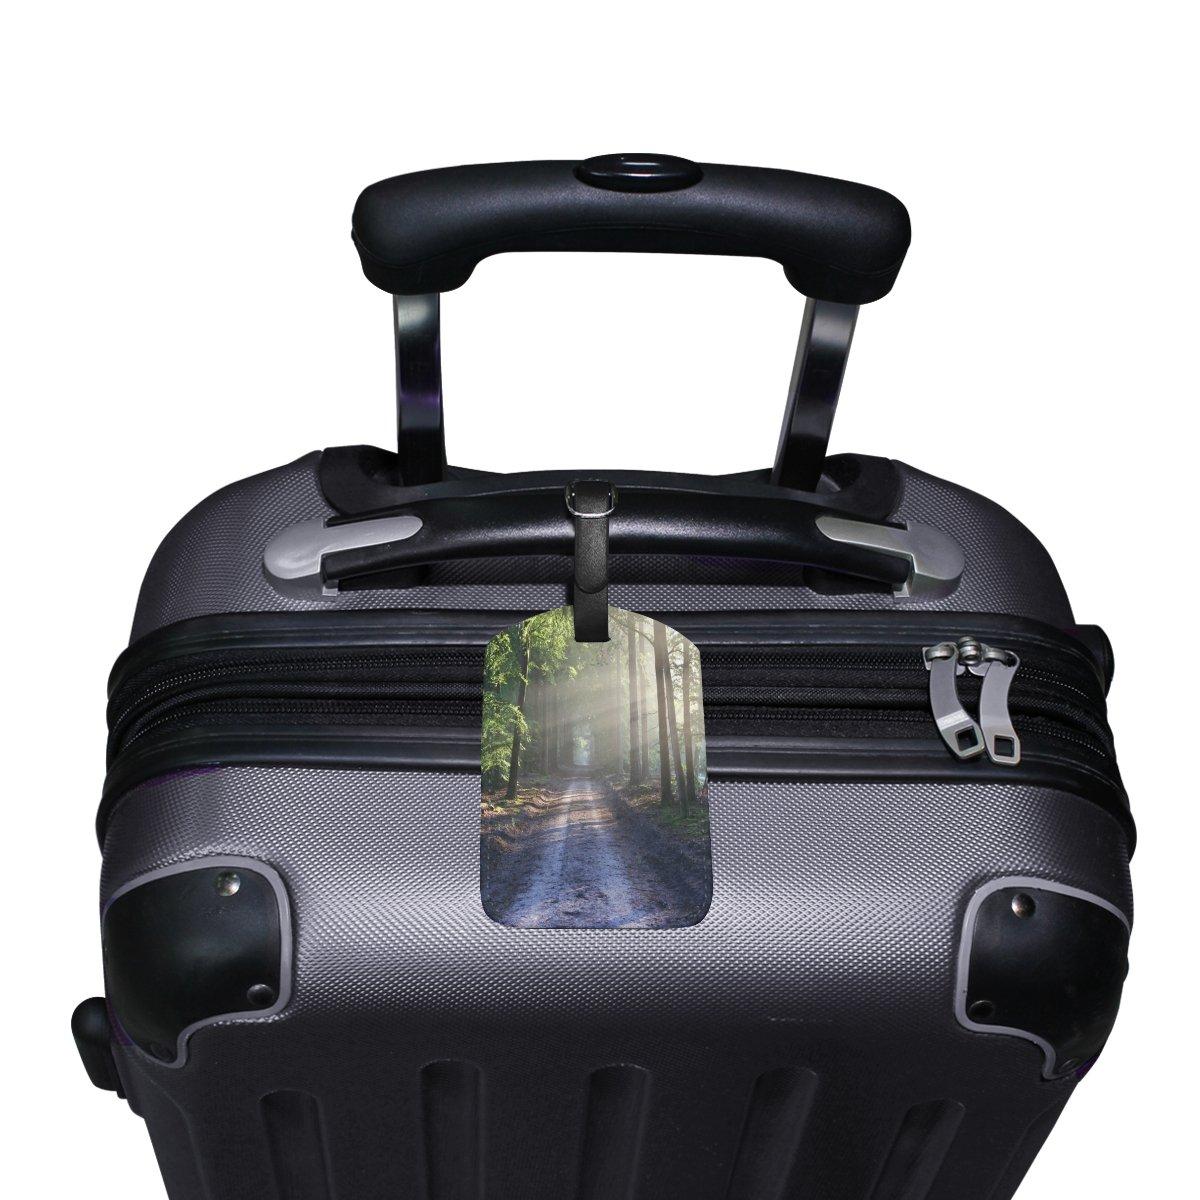 1Pcs Saobao Travel Luggage Tag Road PU Leather Baggage Suitcase Travel ID Bag Tag